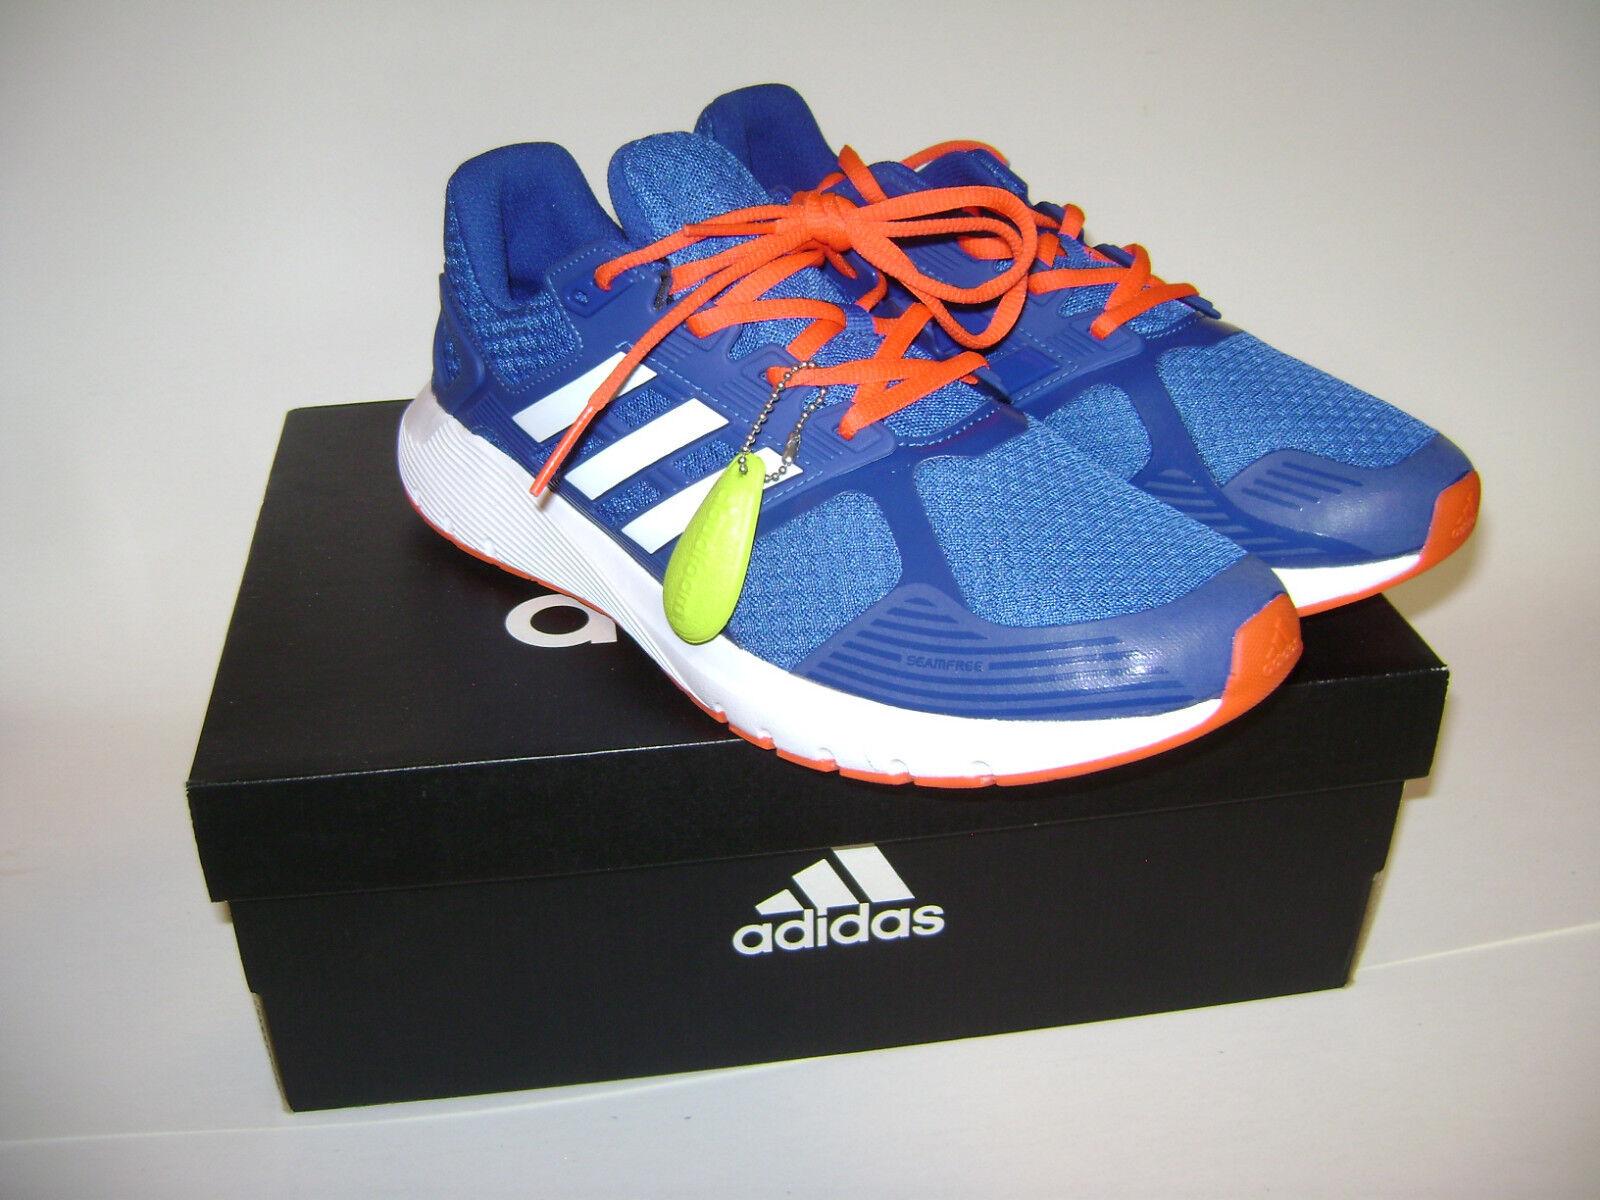 Pennino adidas duramo 8 uomini 'scarpe da ginnastica scarpe sz arancione 10 bianco e blu arancione sz bb4660 017d03